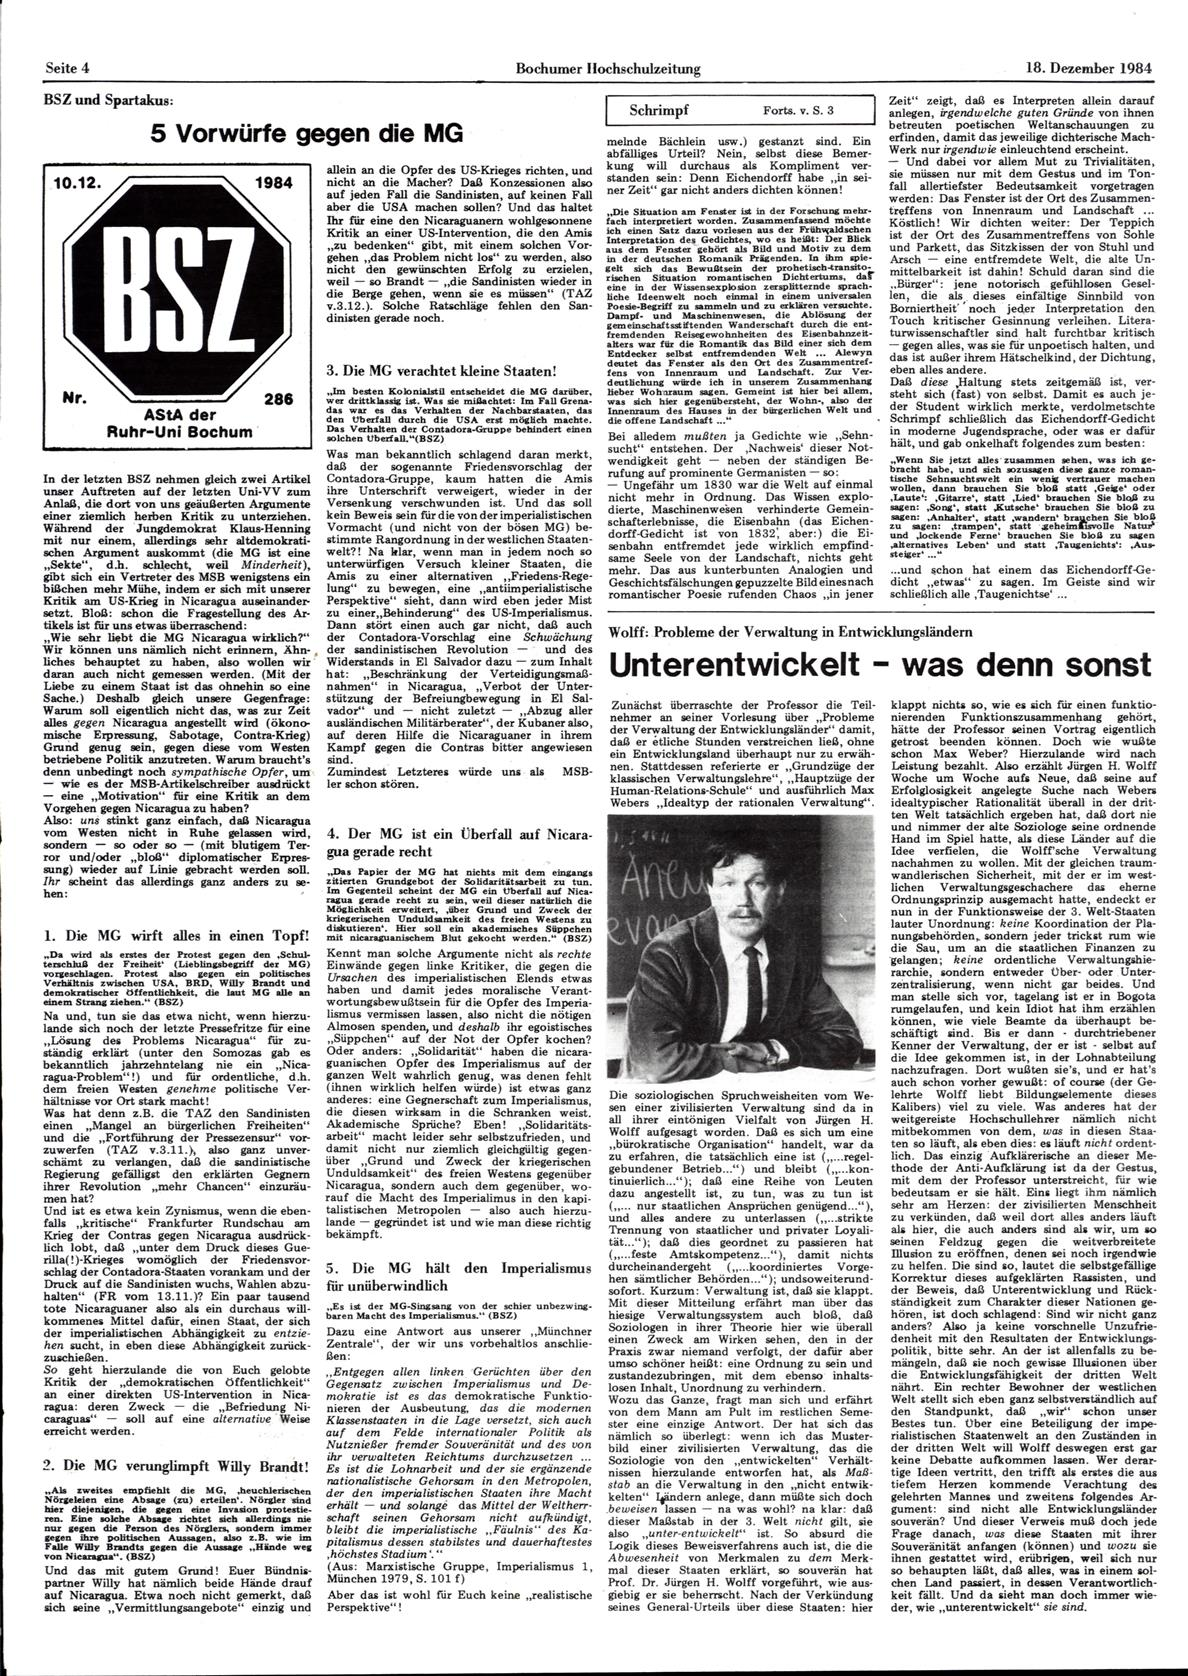 Bochum_BHZ_19841218_103_004